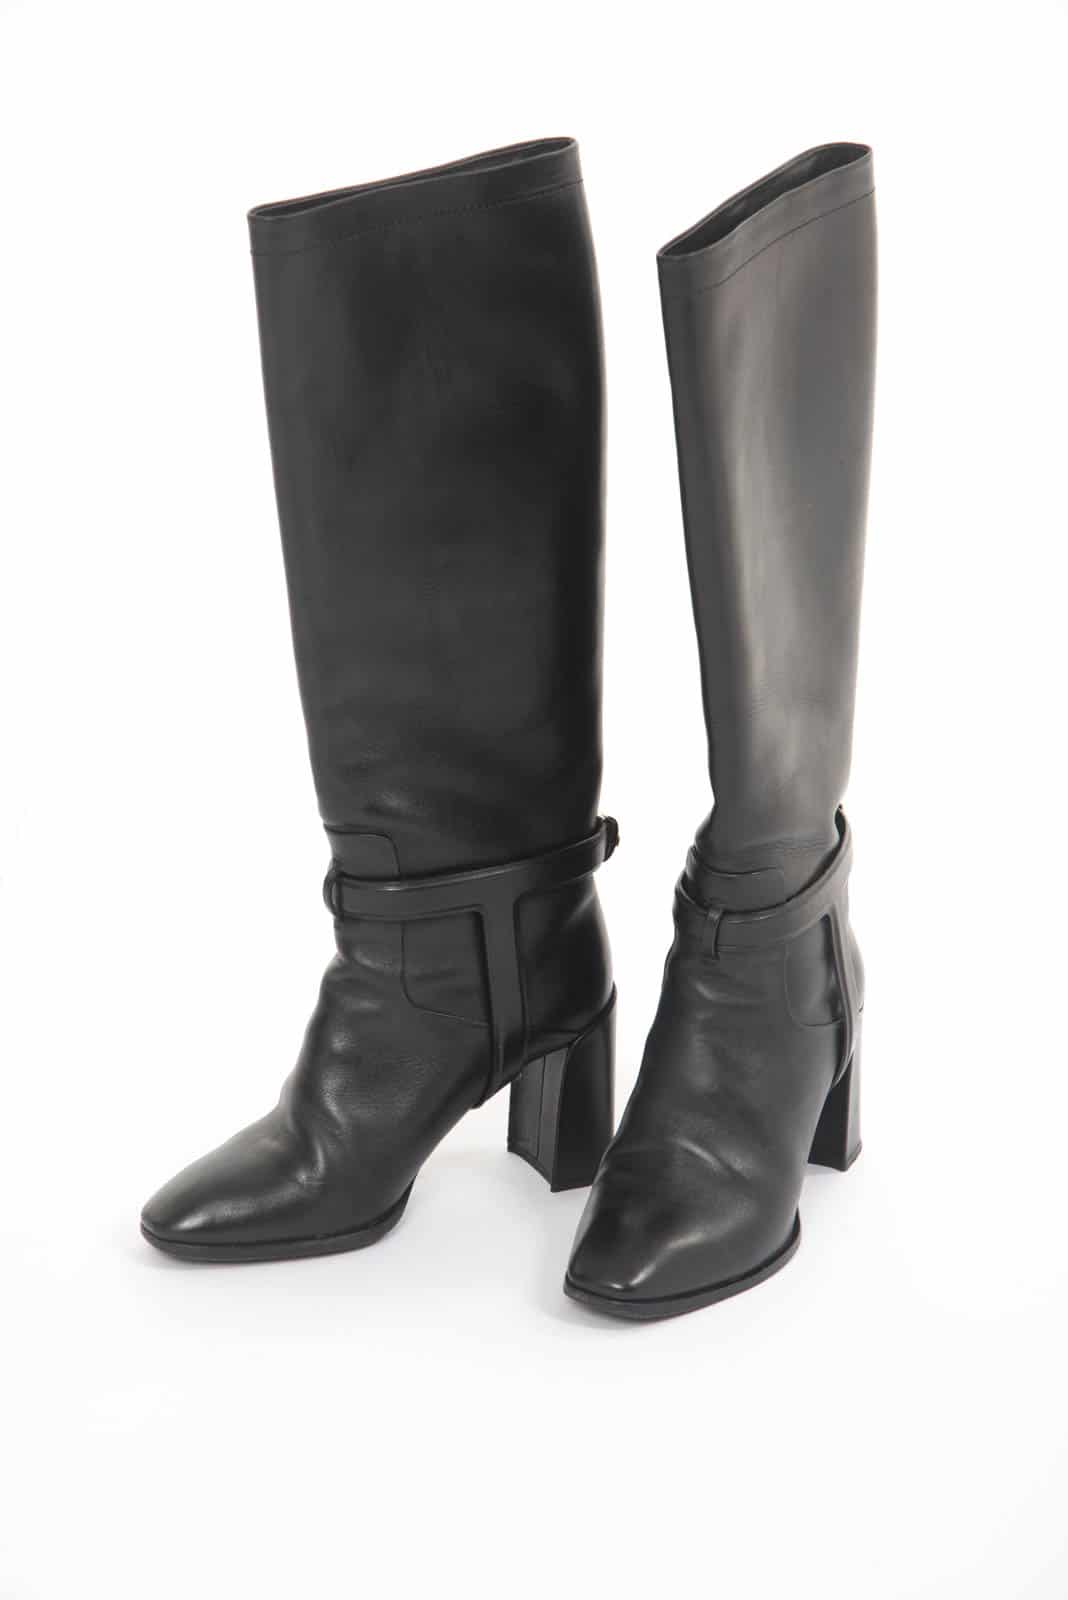 7ace333e2 Christian Dior Black leather Boots - DressXChange